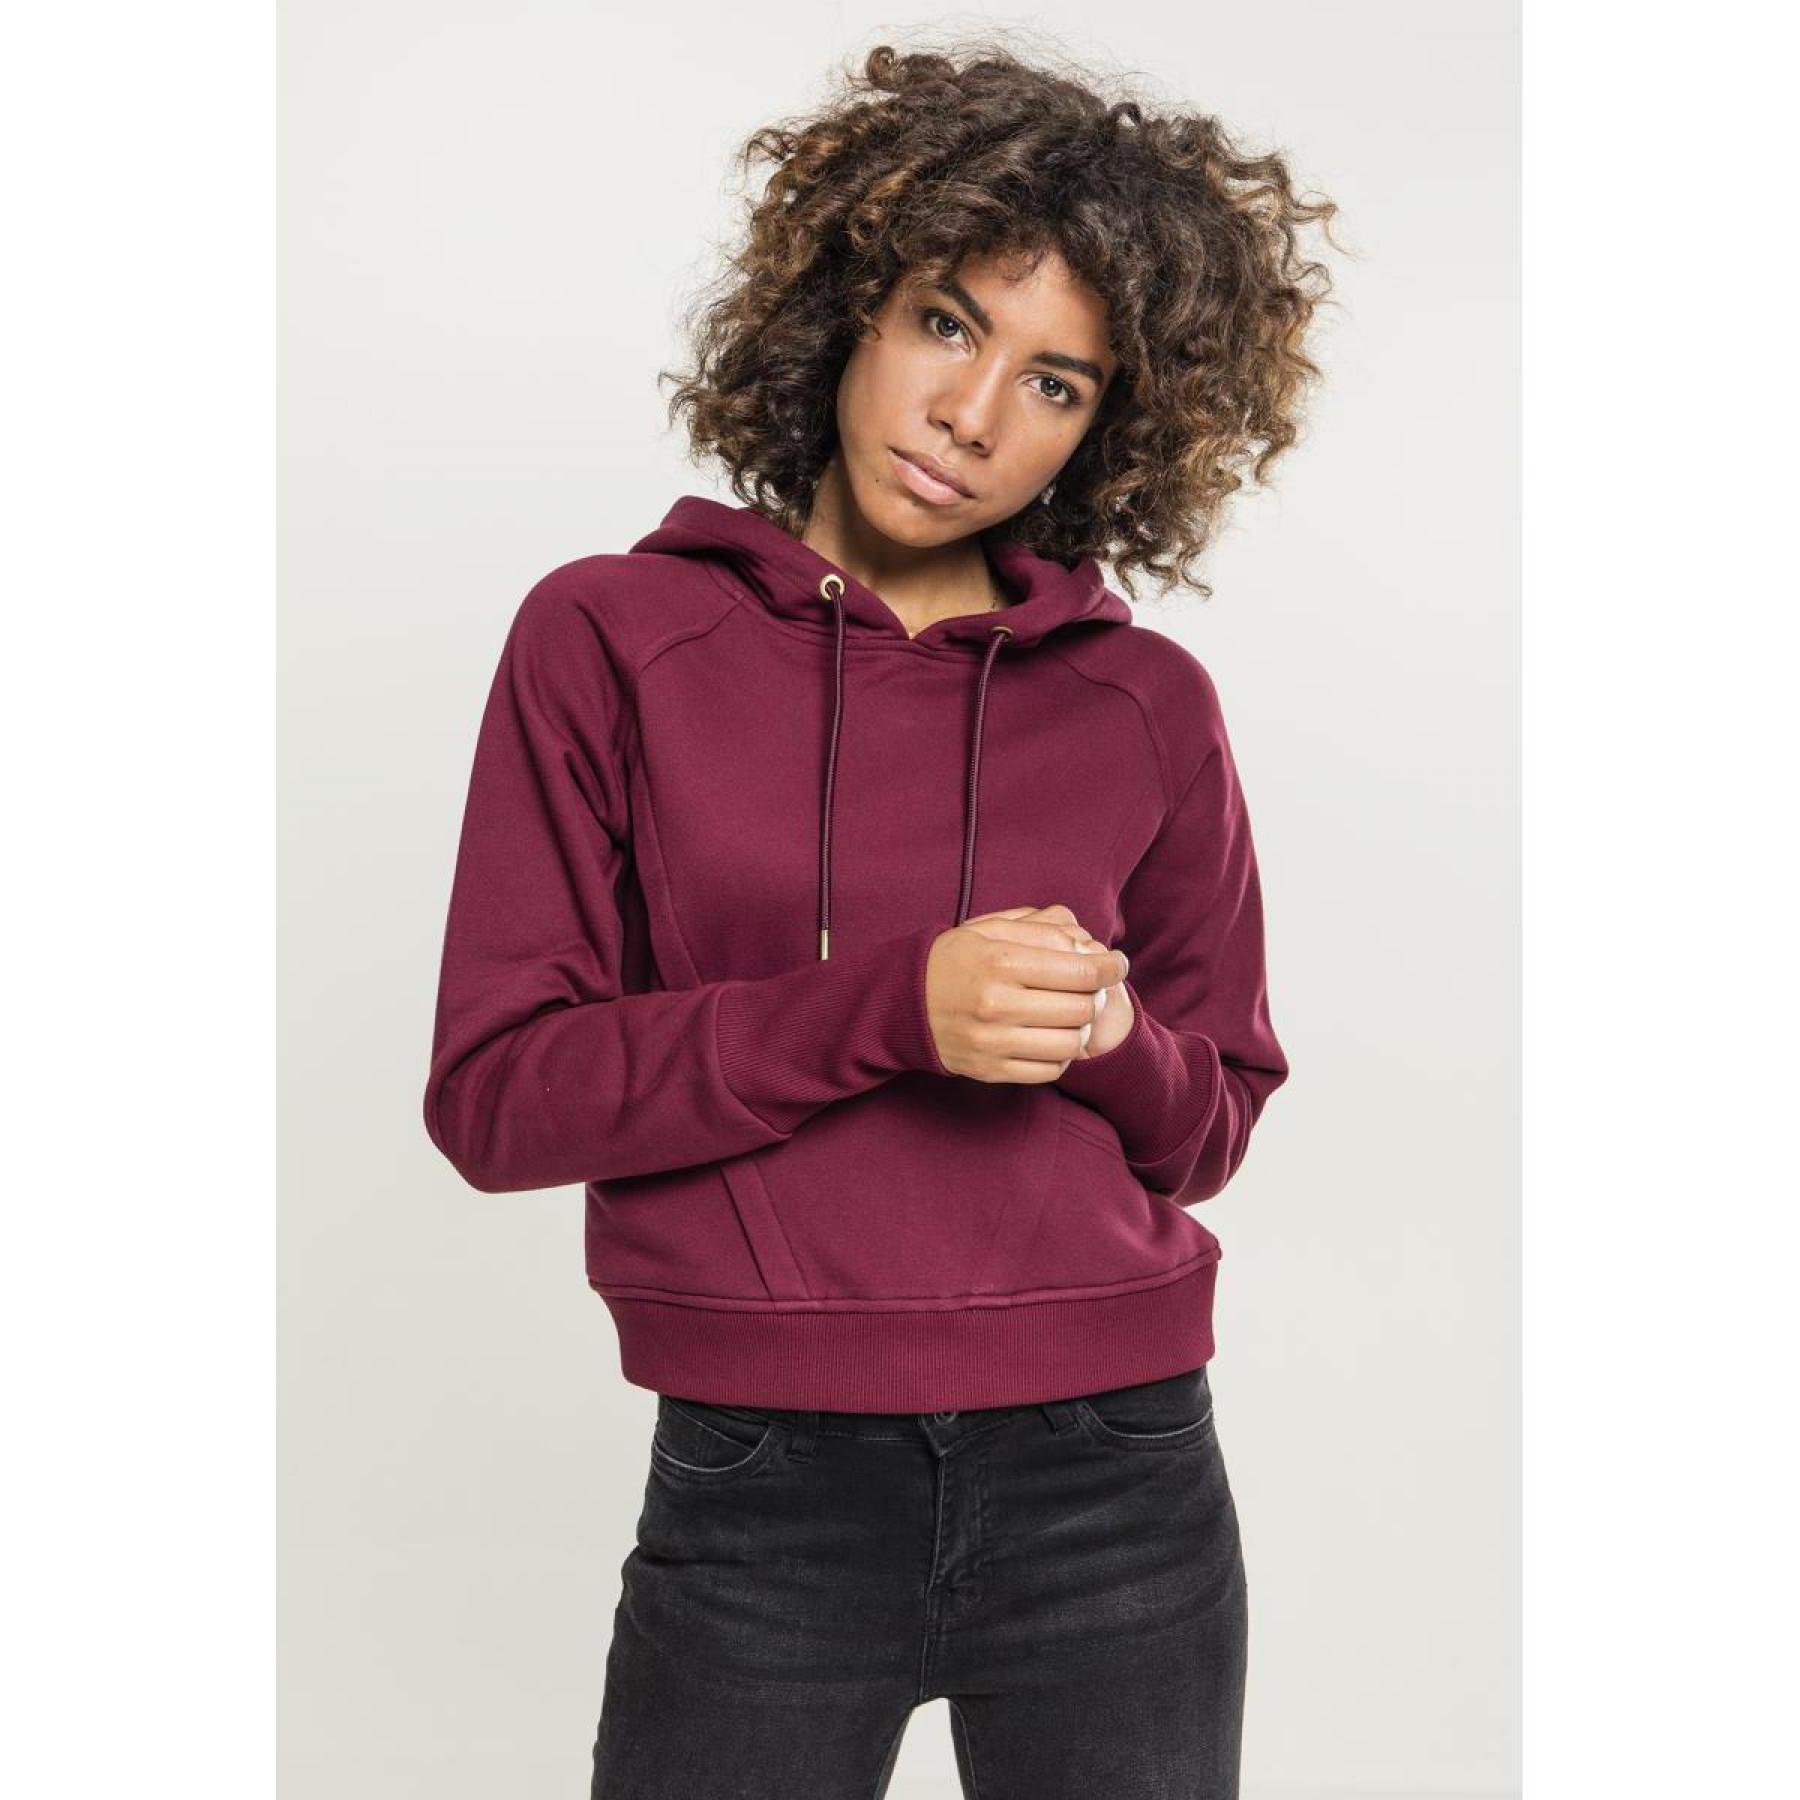 Women's Urban Classic thumb hole sweatshirt